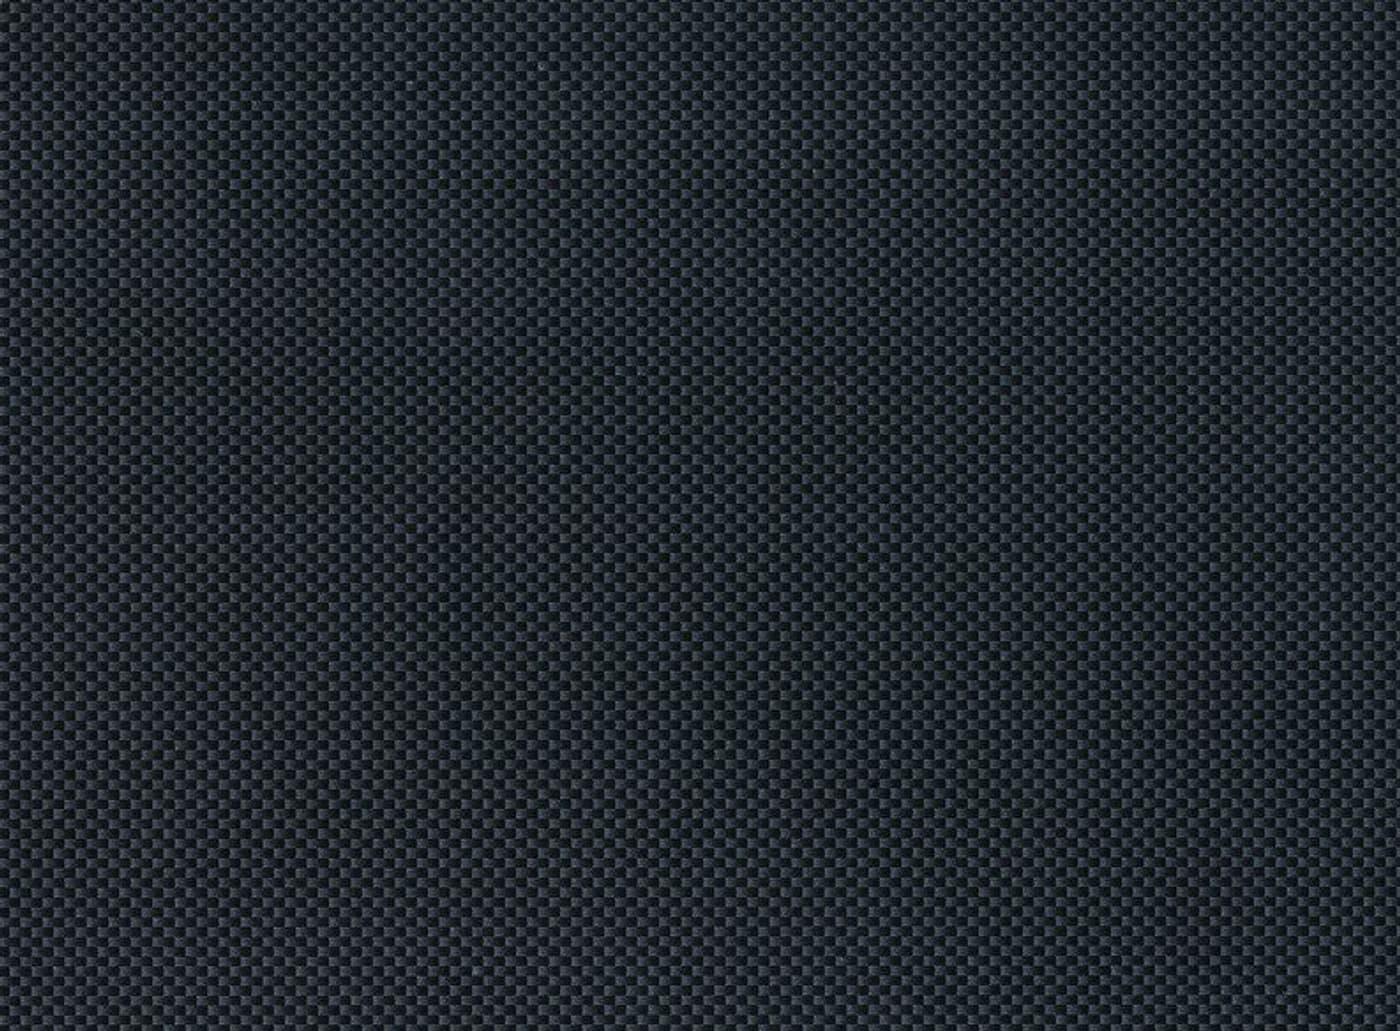 D c fix carbonfolien selbstklebend schwarz silber migros for Dc fix klebefolie